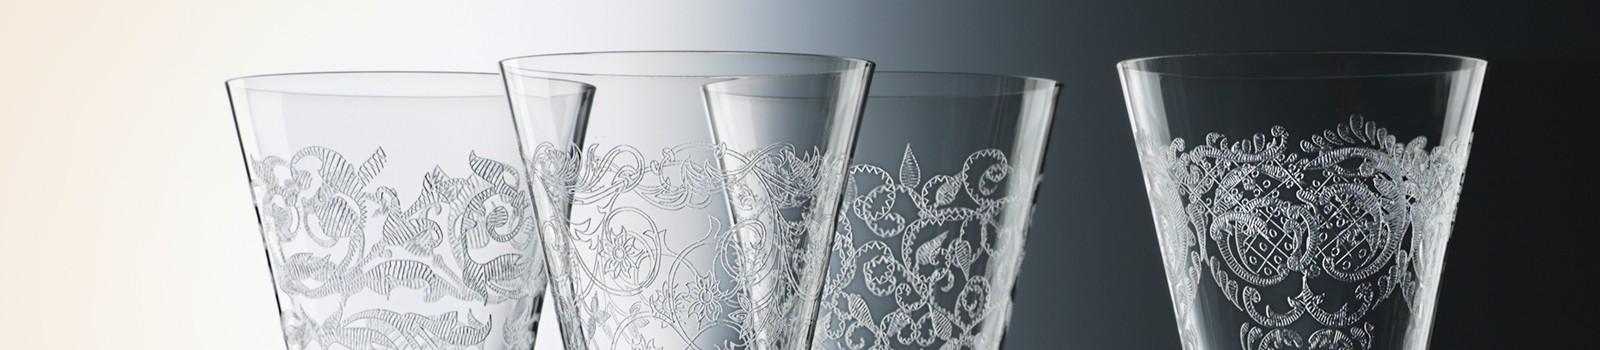 Glassware & Stemware